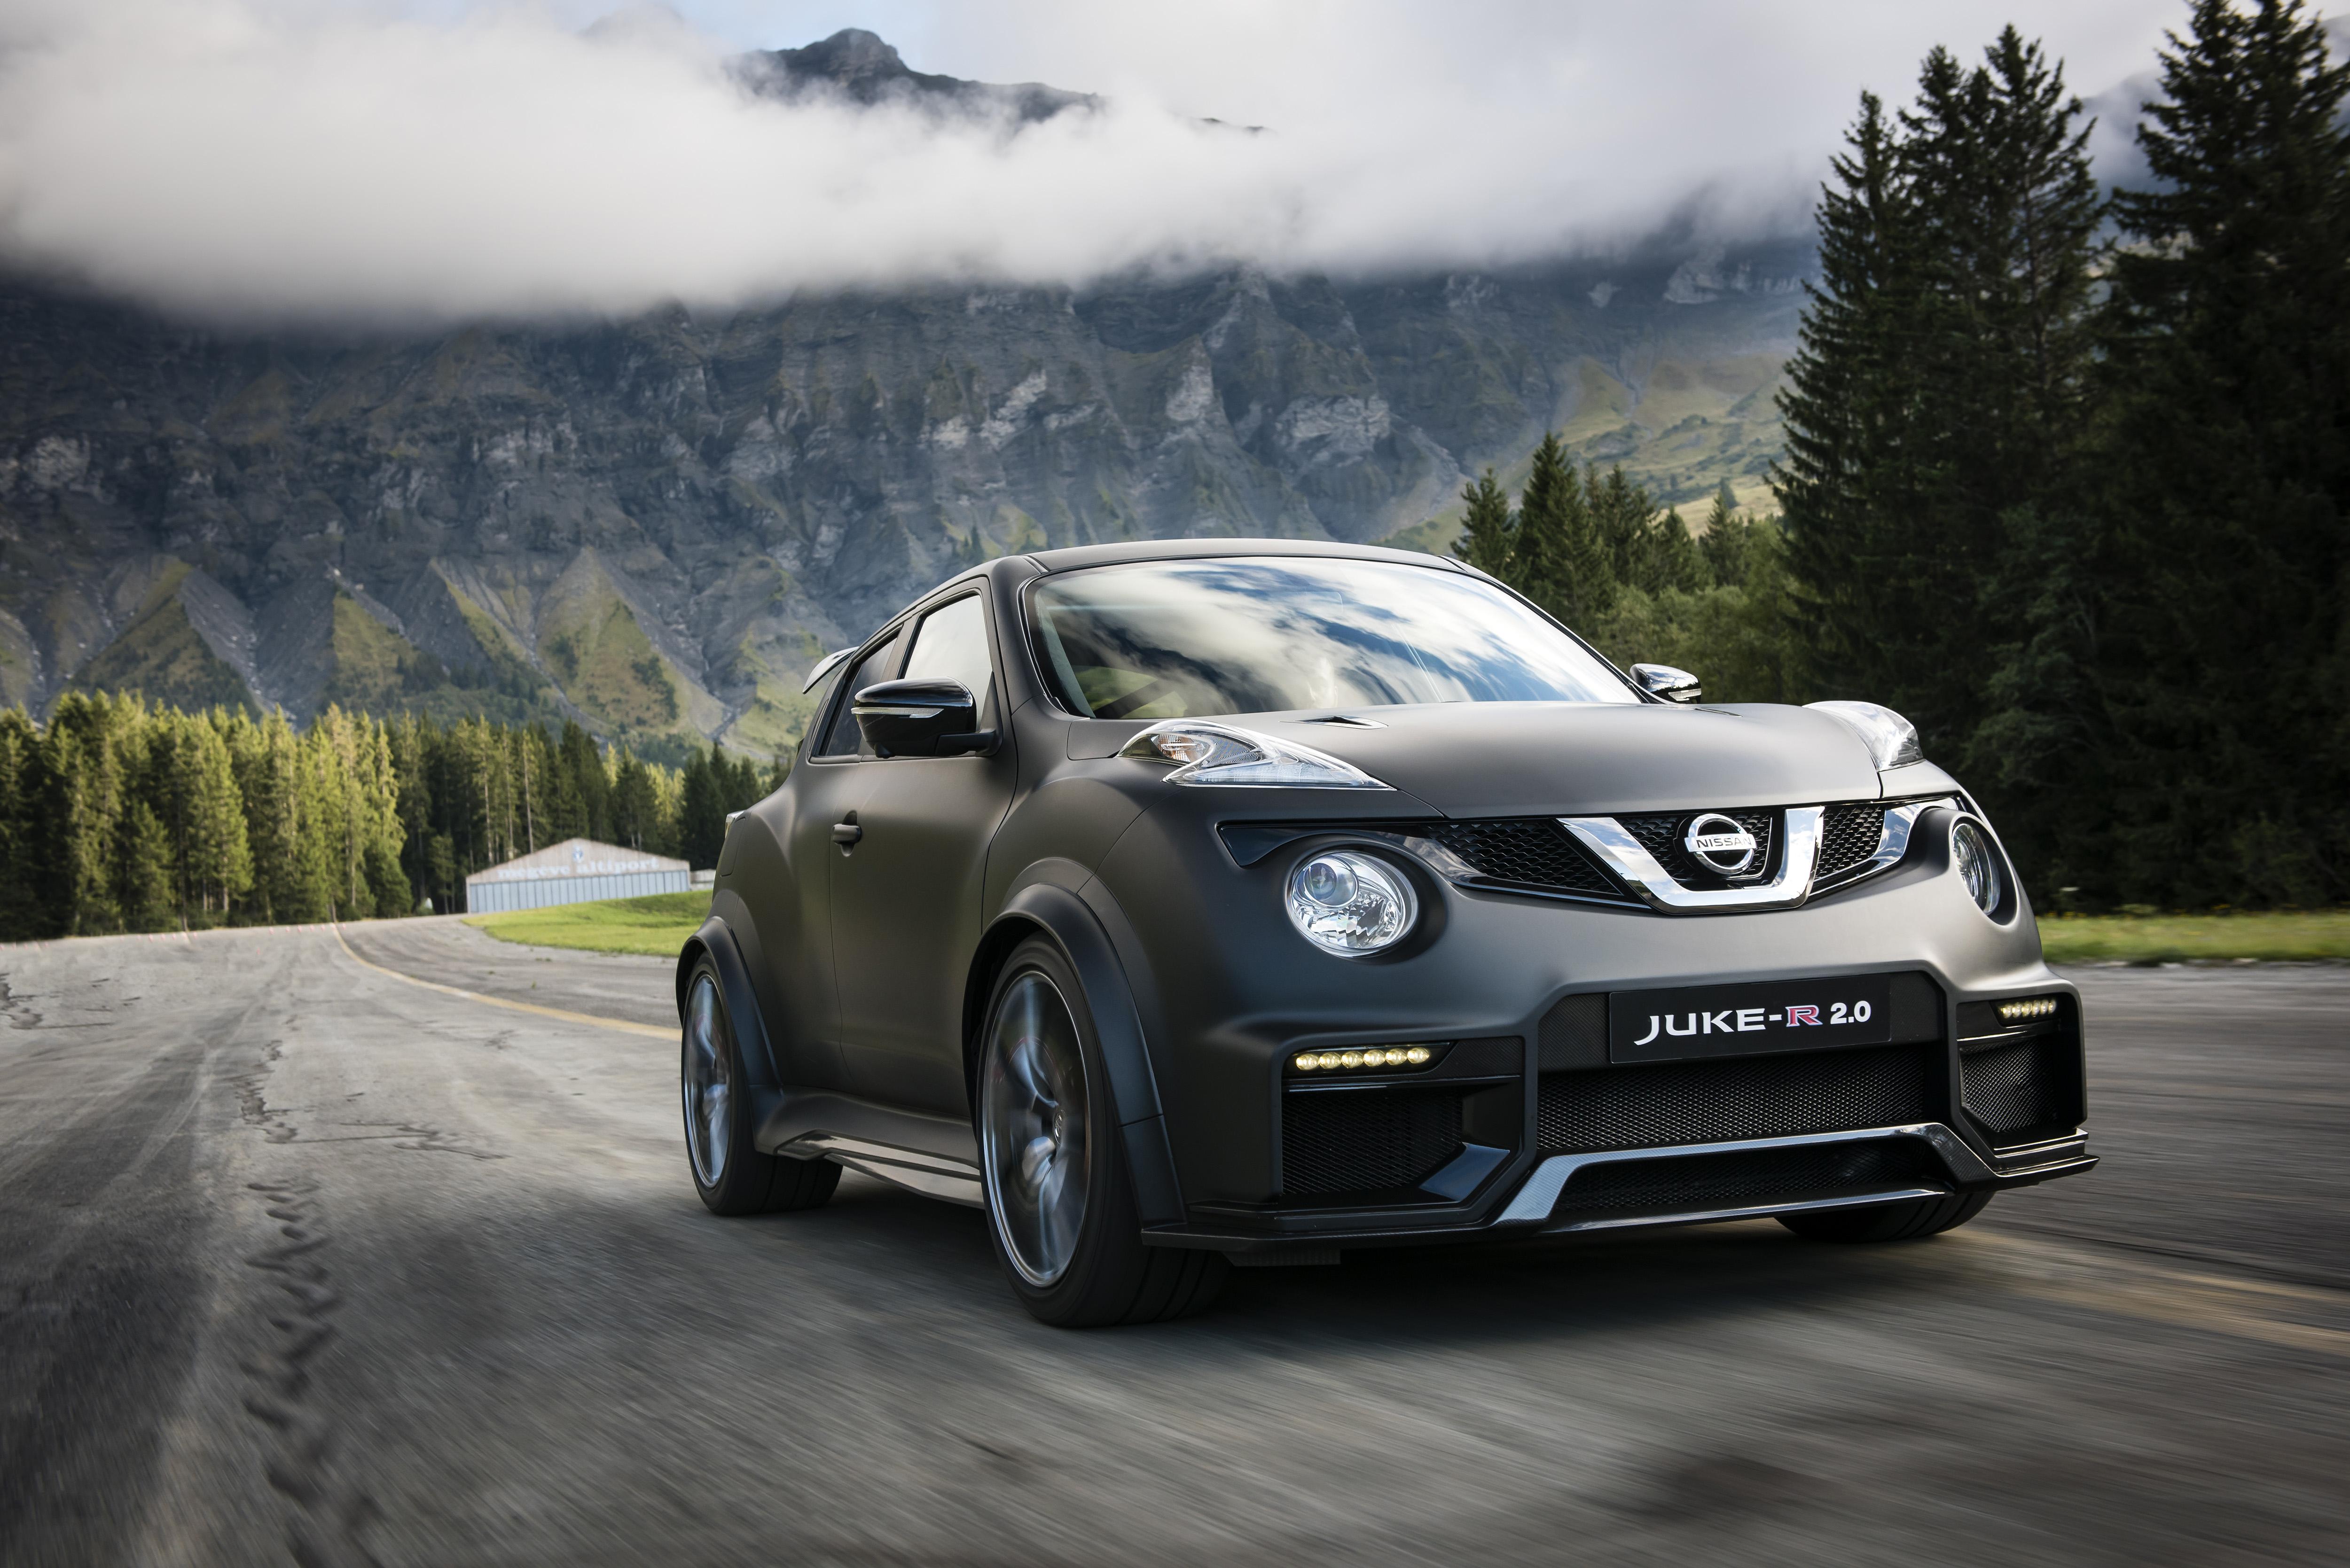 nissan juke 2017 auto plus 2017 2018 best cars reviews. Black Bedroom Furniture Sets. Home Design Ideas